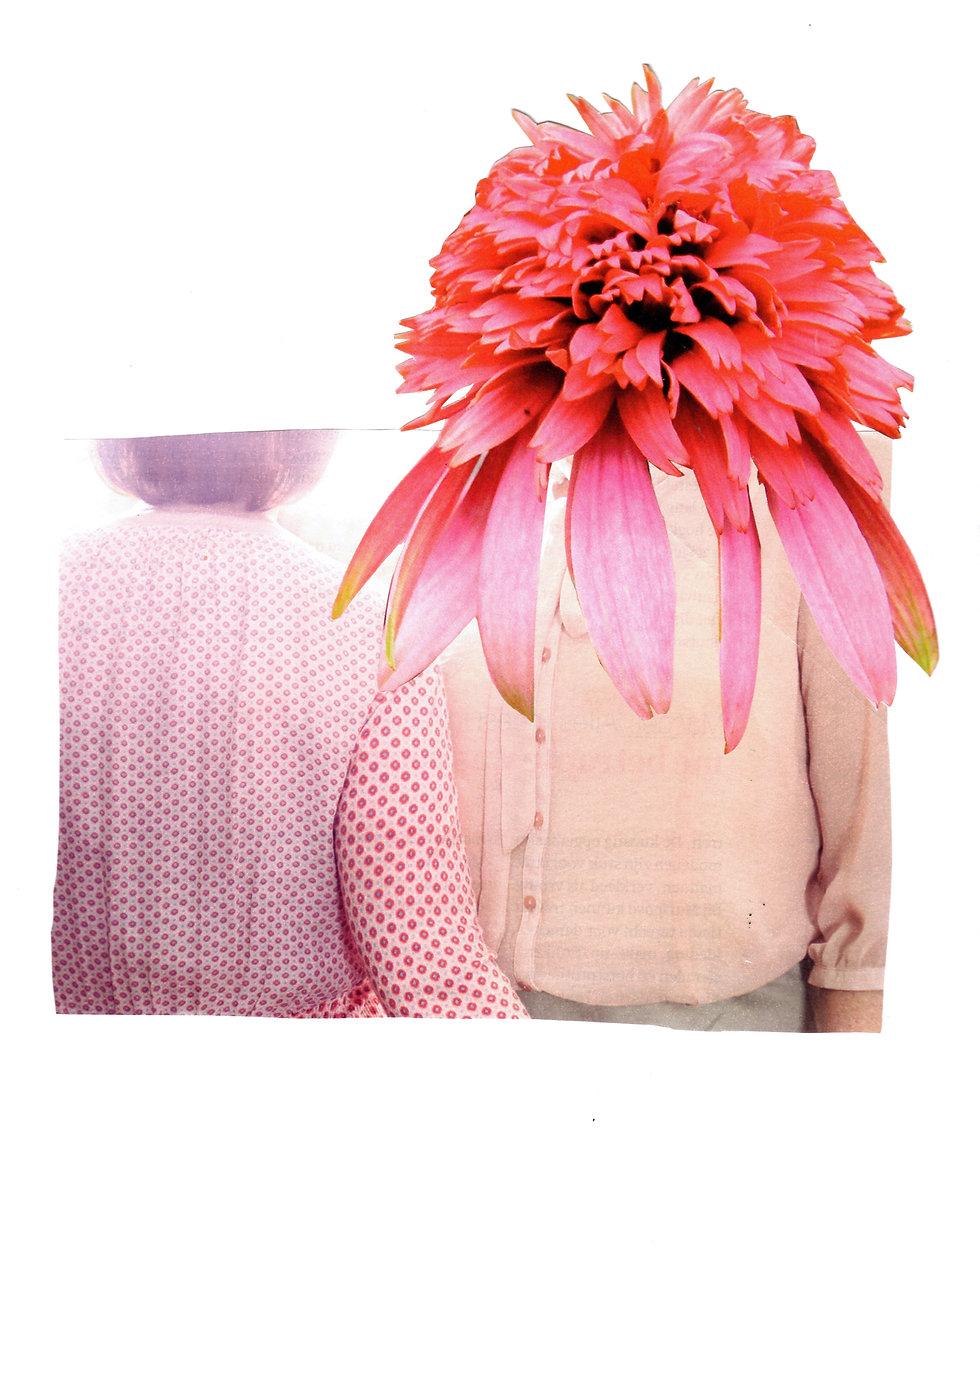 Flowerhead Glow Isabelle Zumbrink.jpg